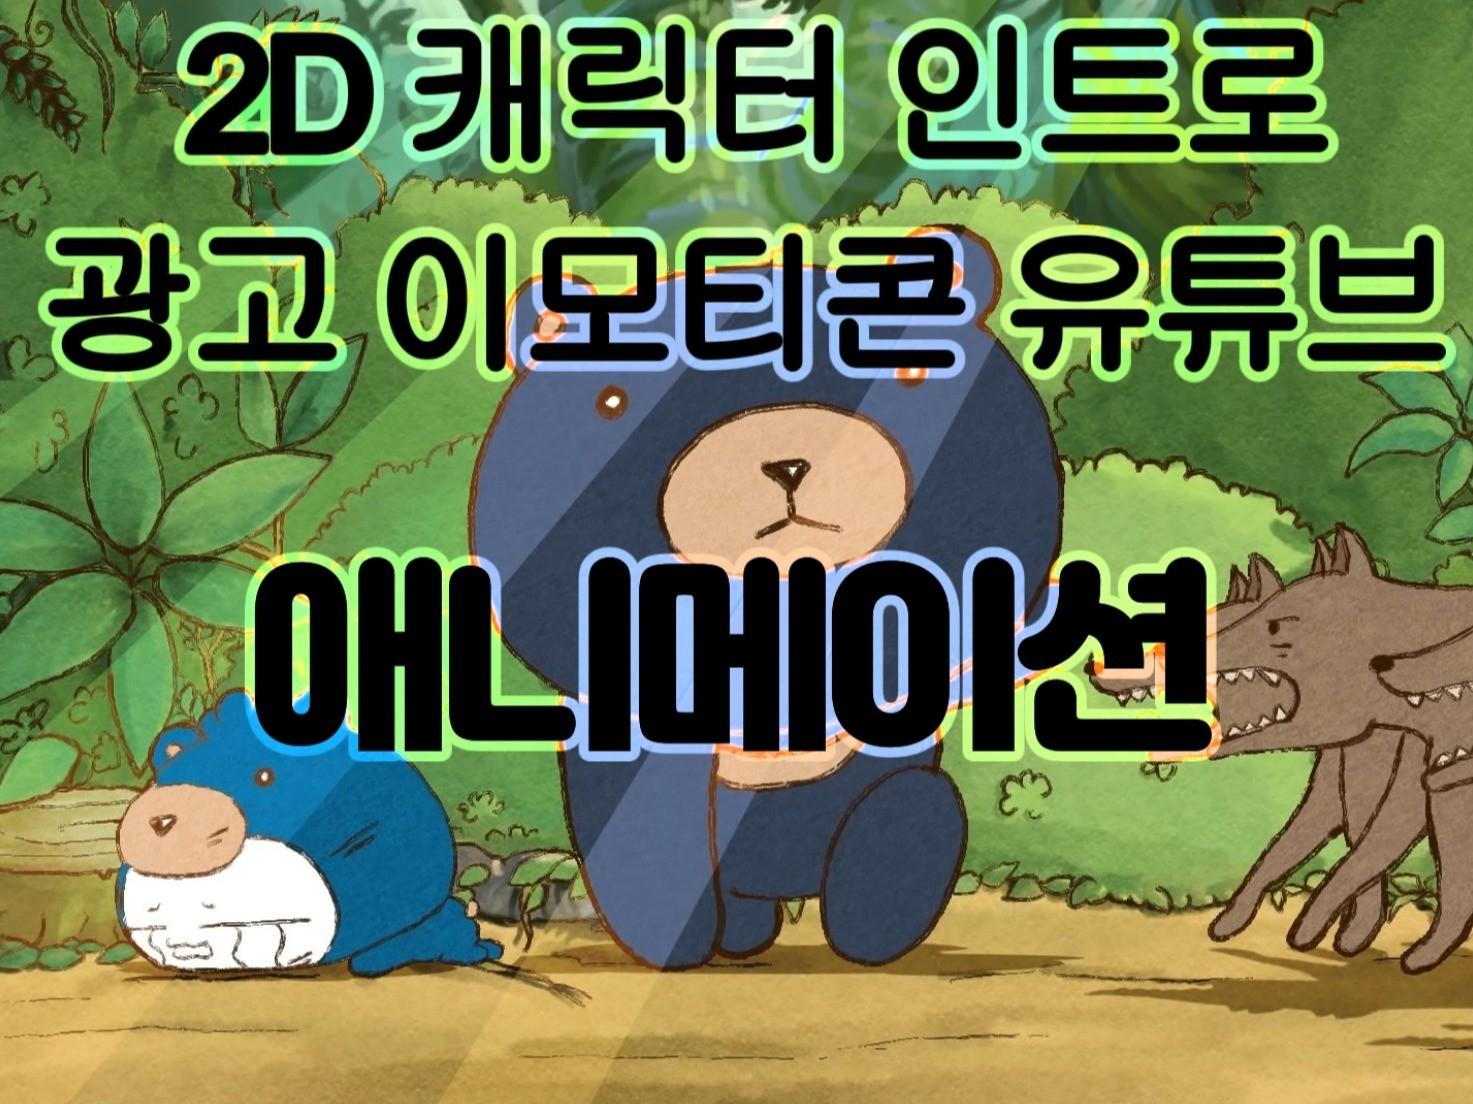 2D캐릭터 광고 이모티콘 유튜브 애니메이션 제작해 드립니다.